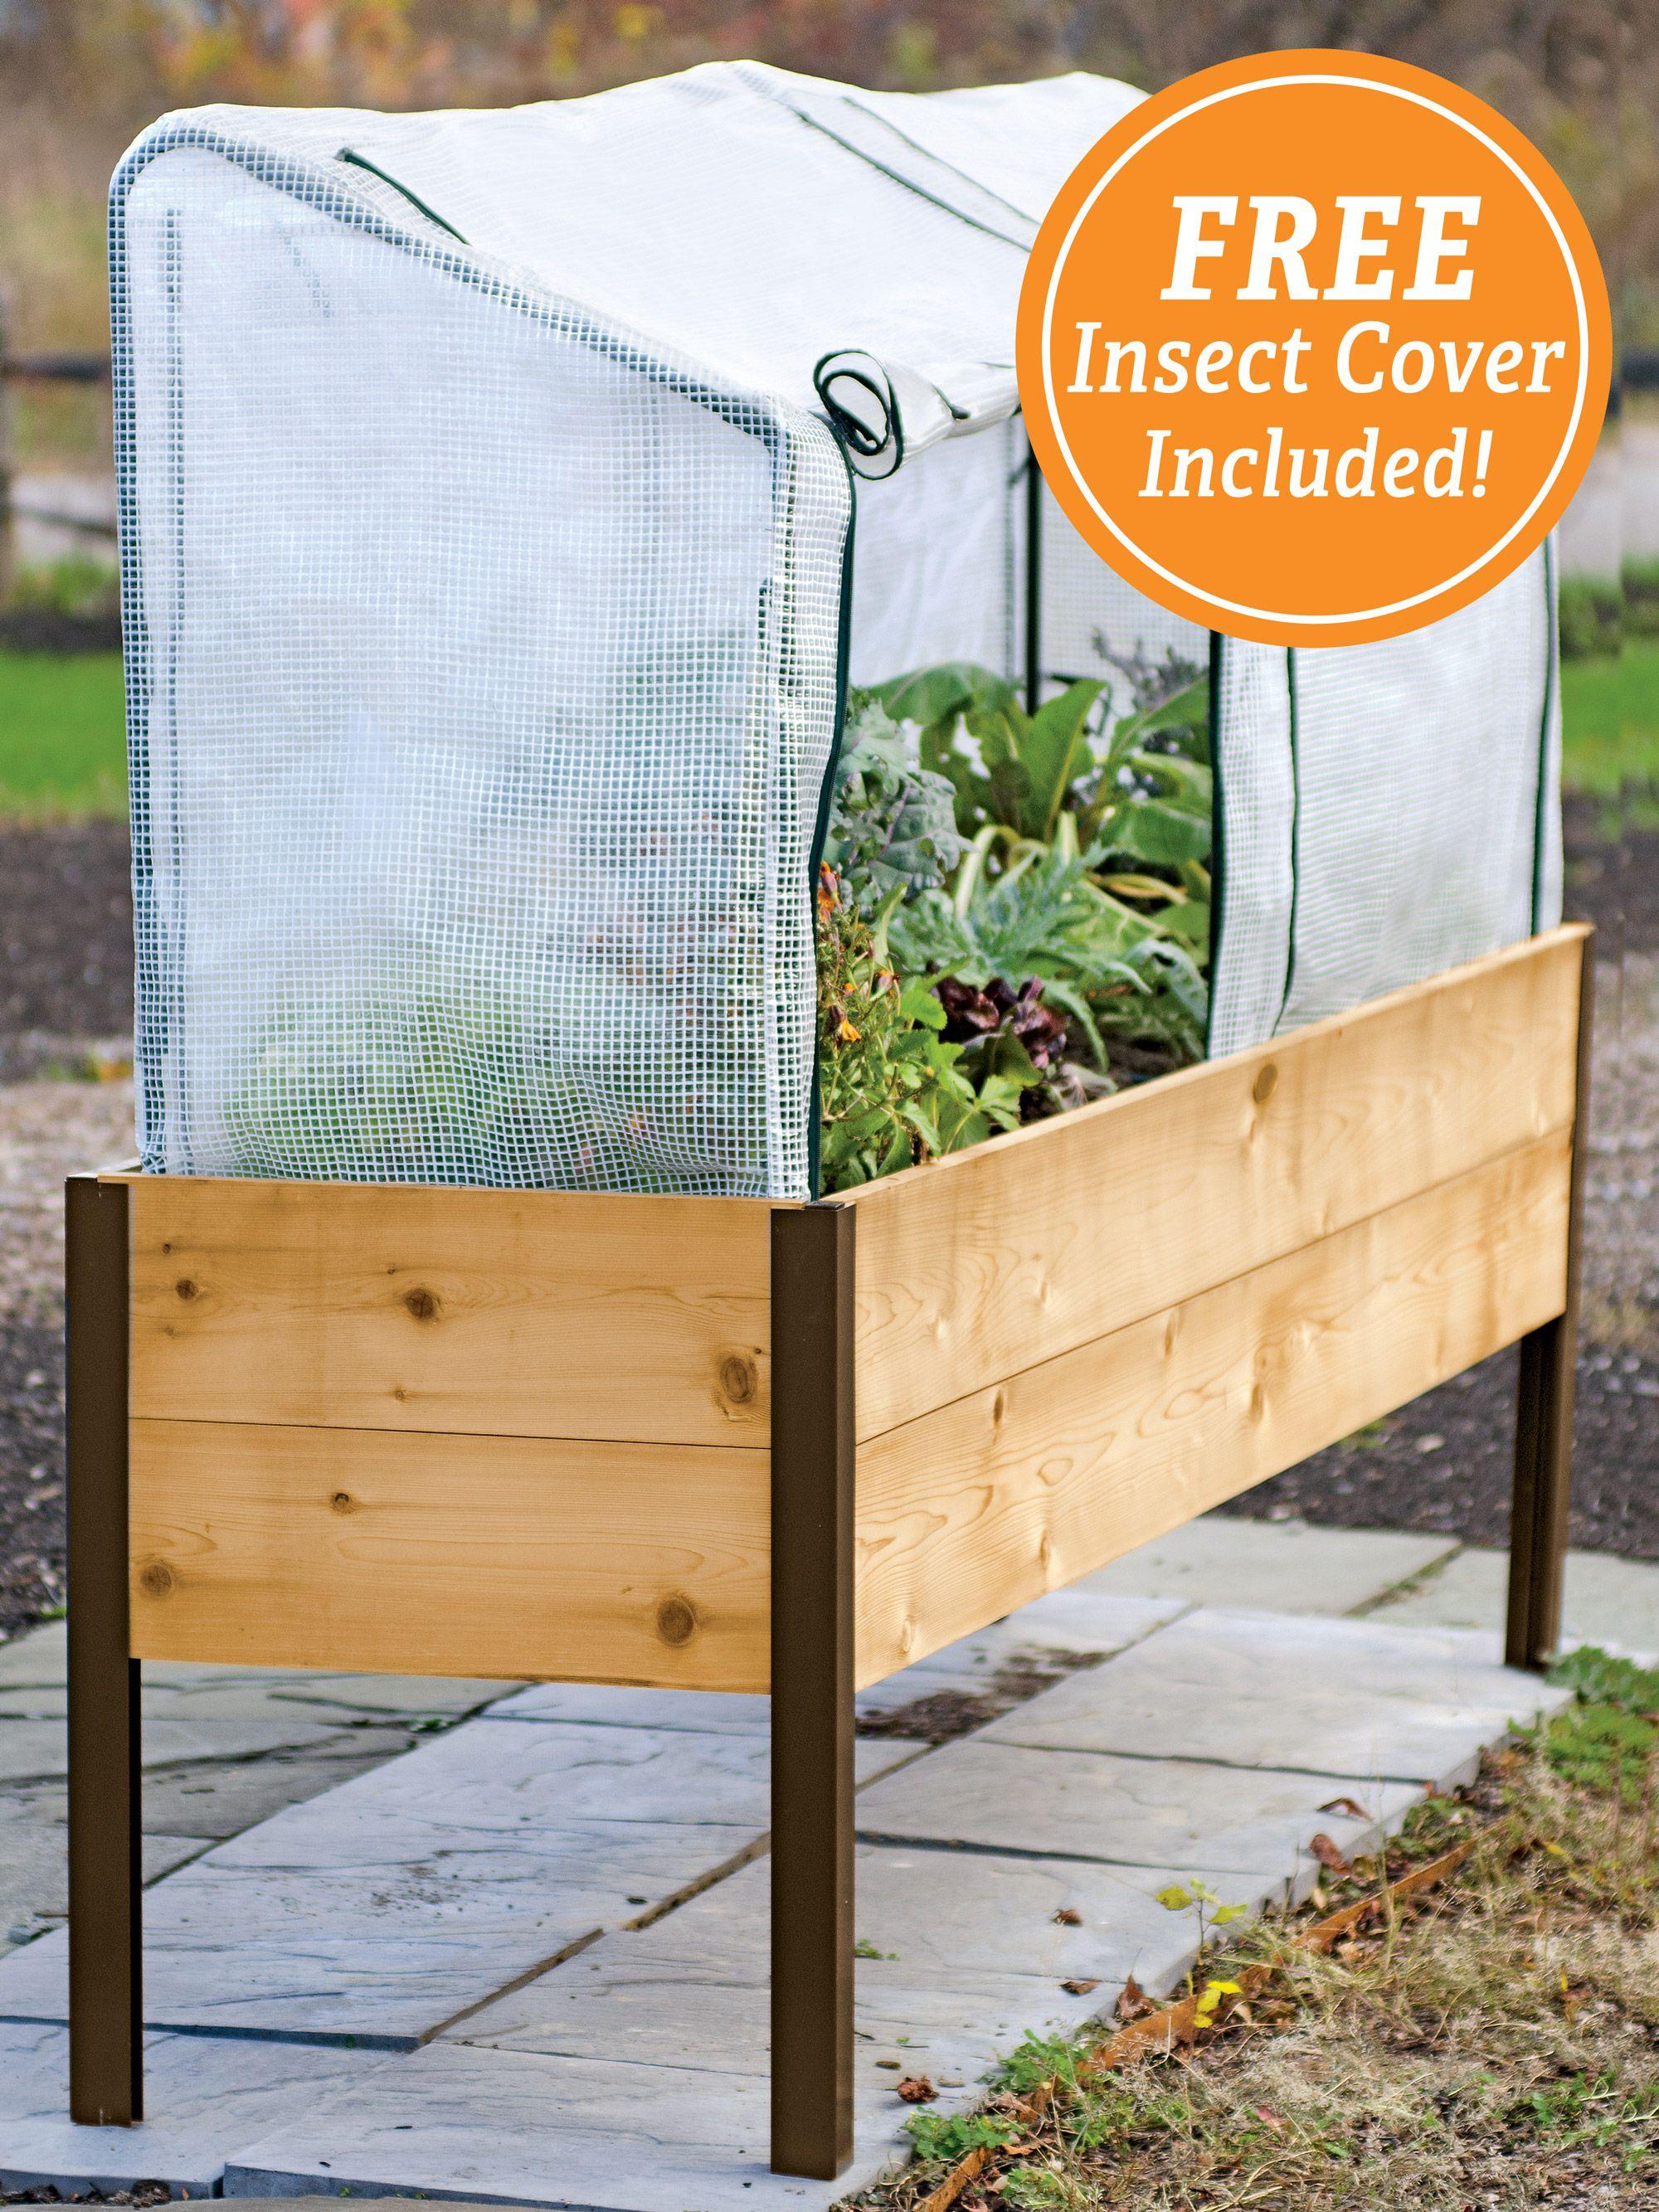 Gardenquilt Floating Row Cover Fabric Gardener S Supply